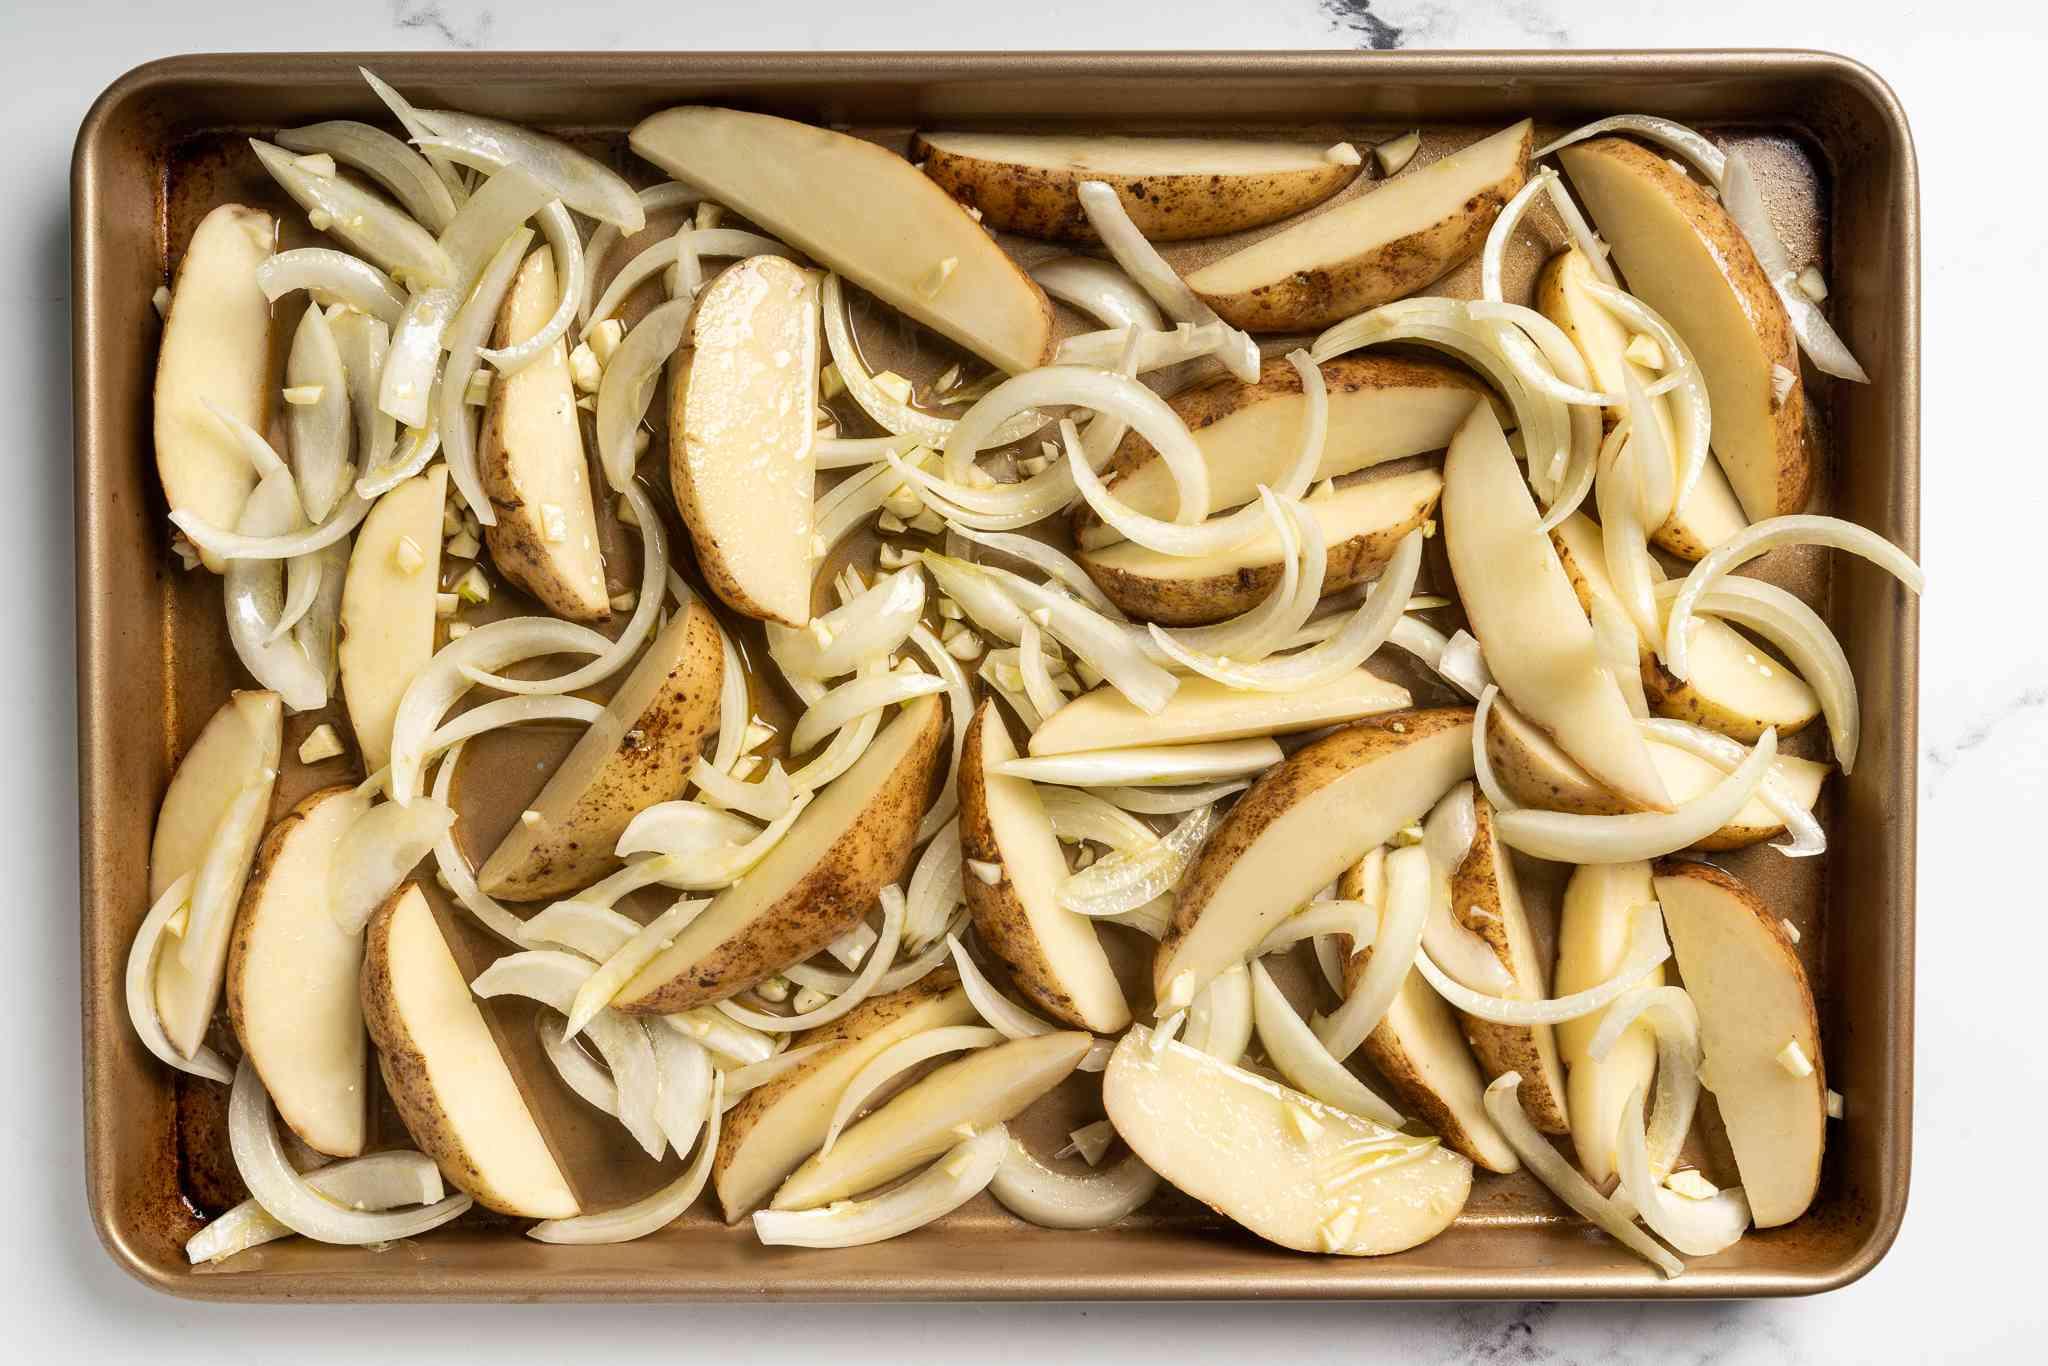 potatoes, onions and garlic on the baking sheet